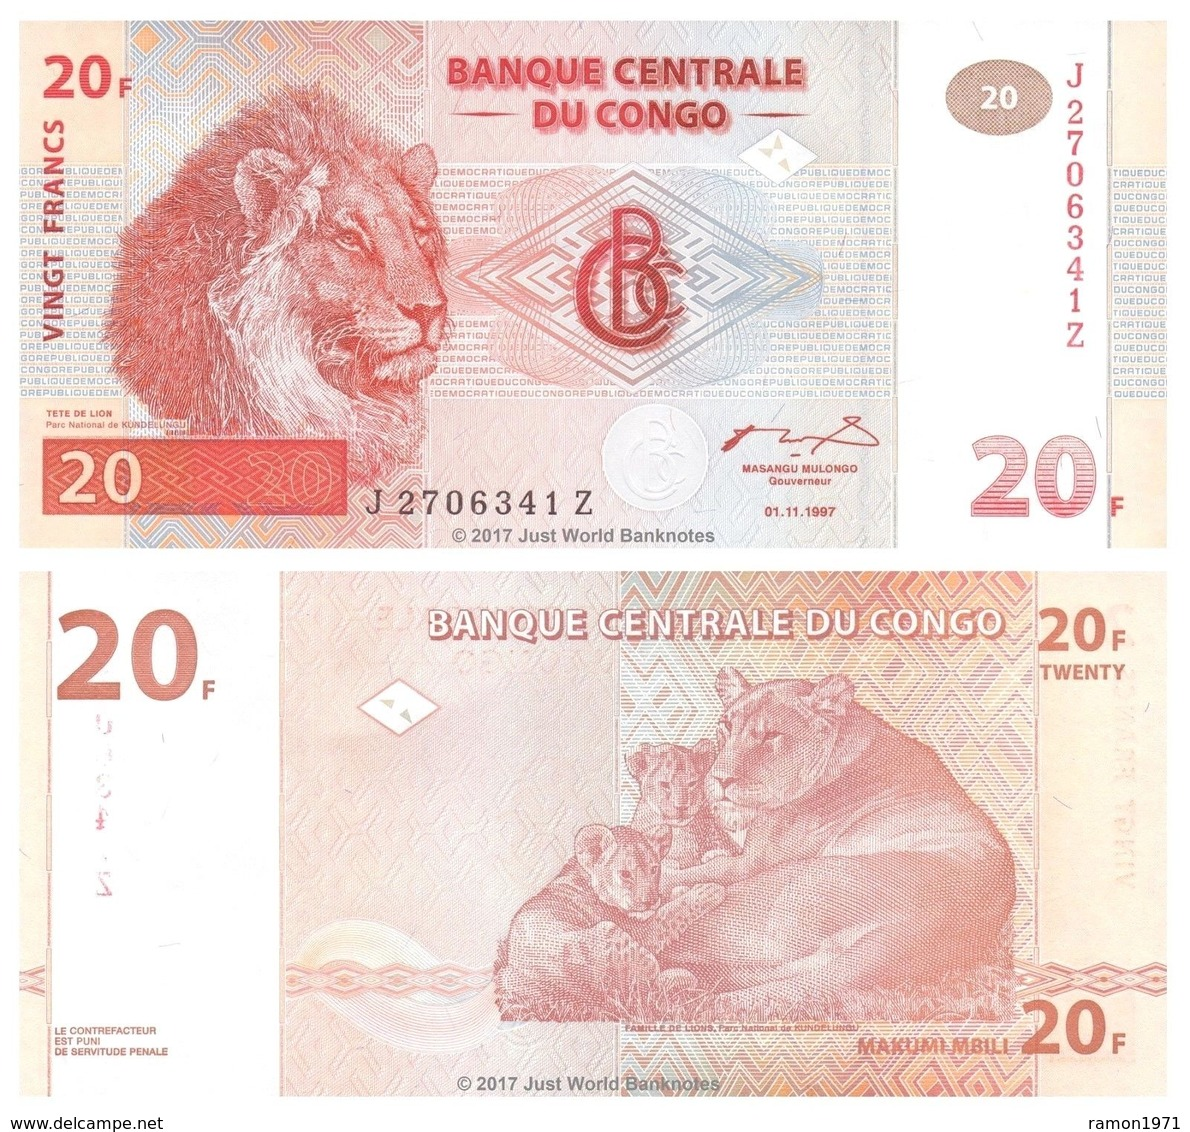 Congo 20 Francs 1997 UNC - Republic Of Congo (Congo-Brazzaville)